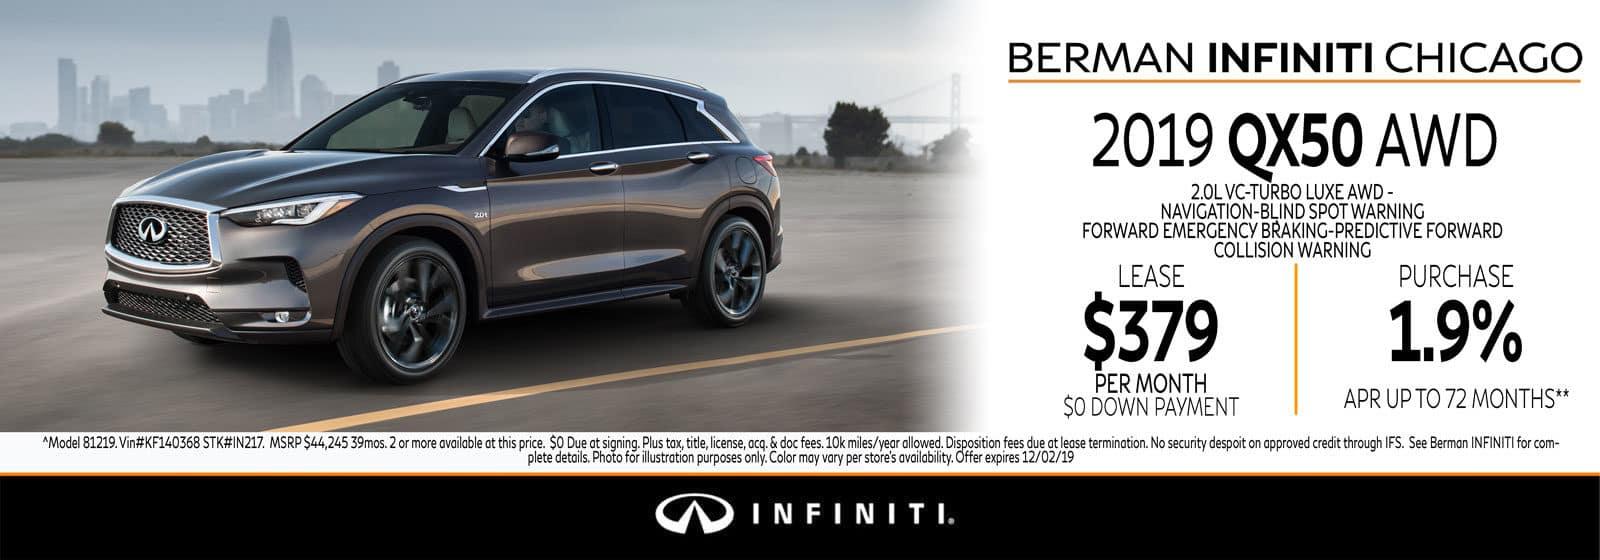 New 2019 INFINITI QX50 November offer at Berman INFINITI Chicago!